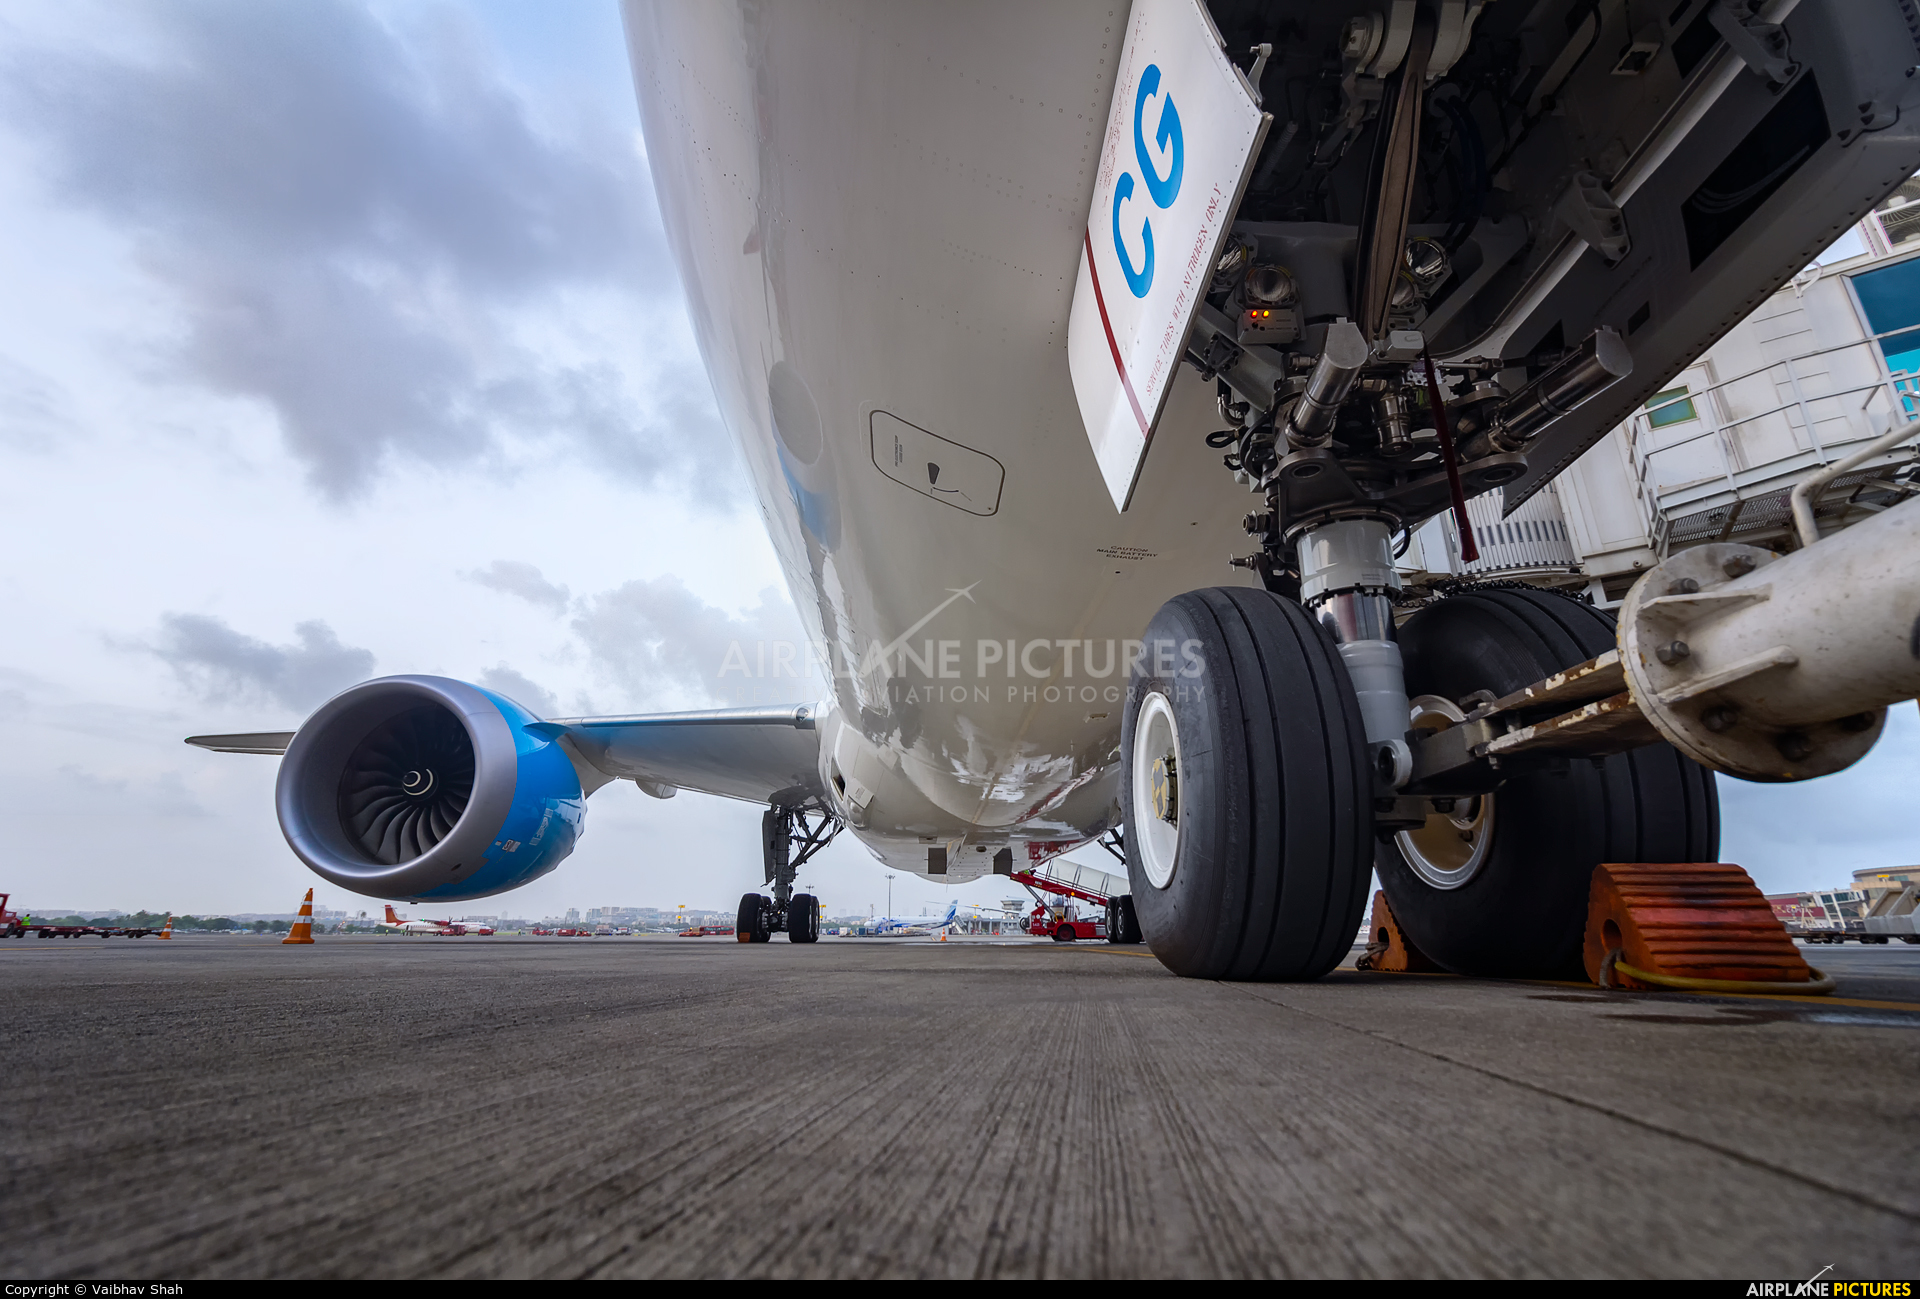 Air Tanzania 5H-TCG aircraft at Mumbai - Chhatrapati Shivaji Intl